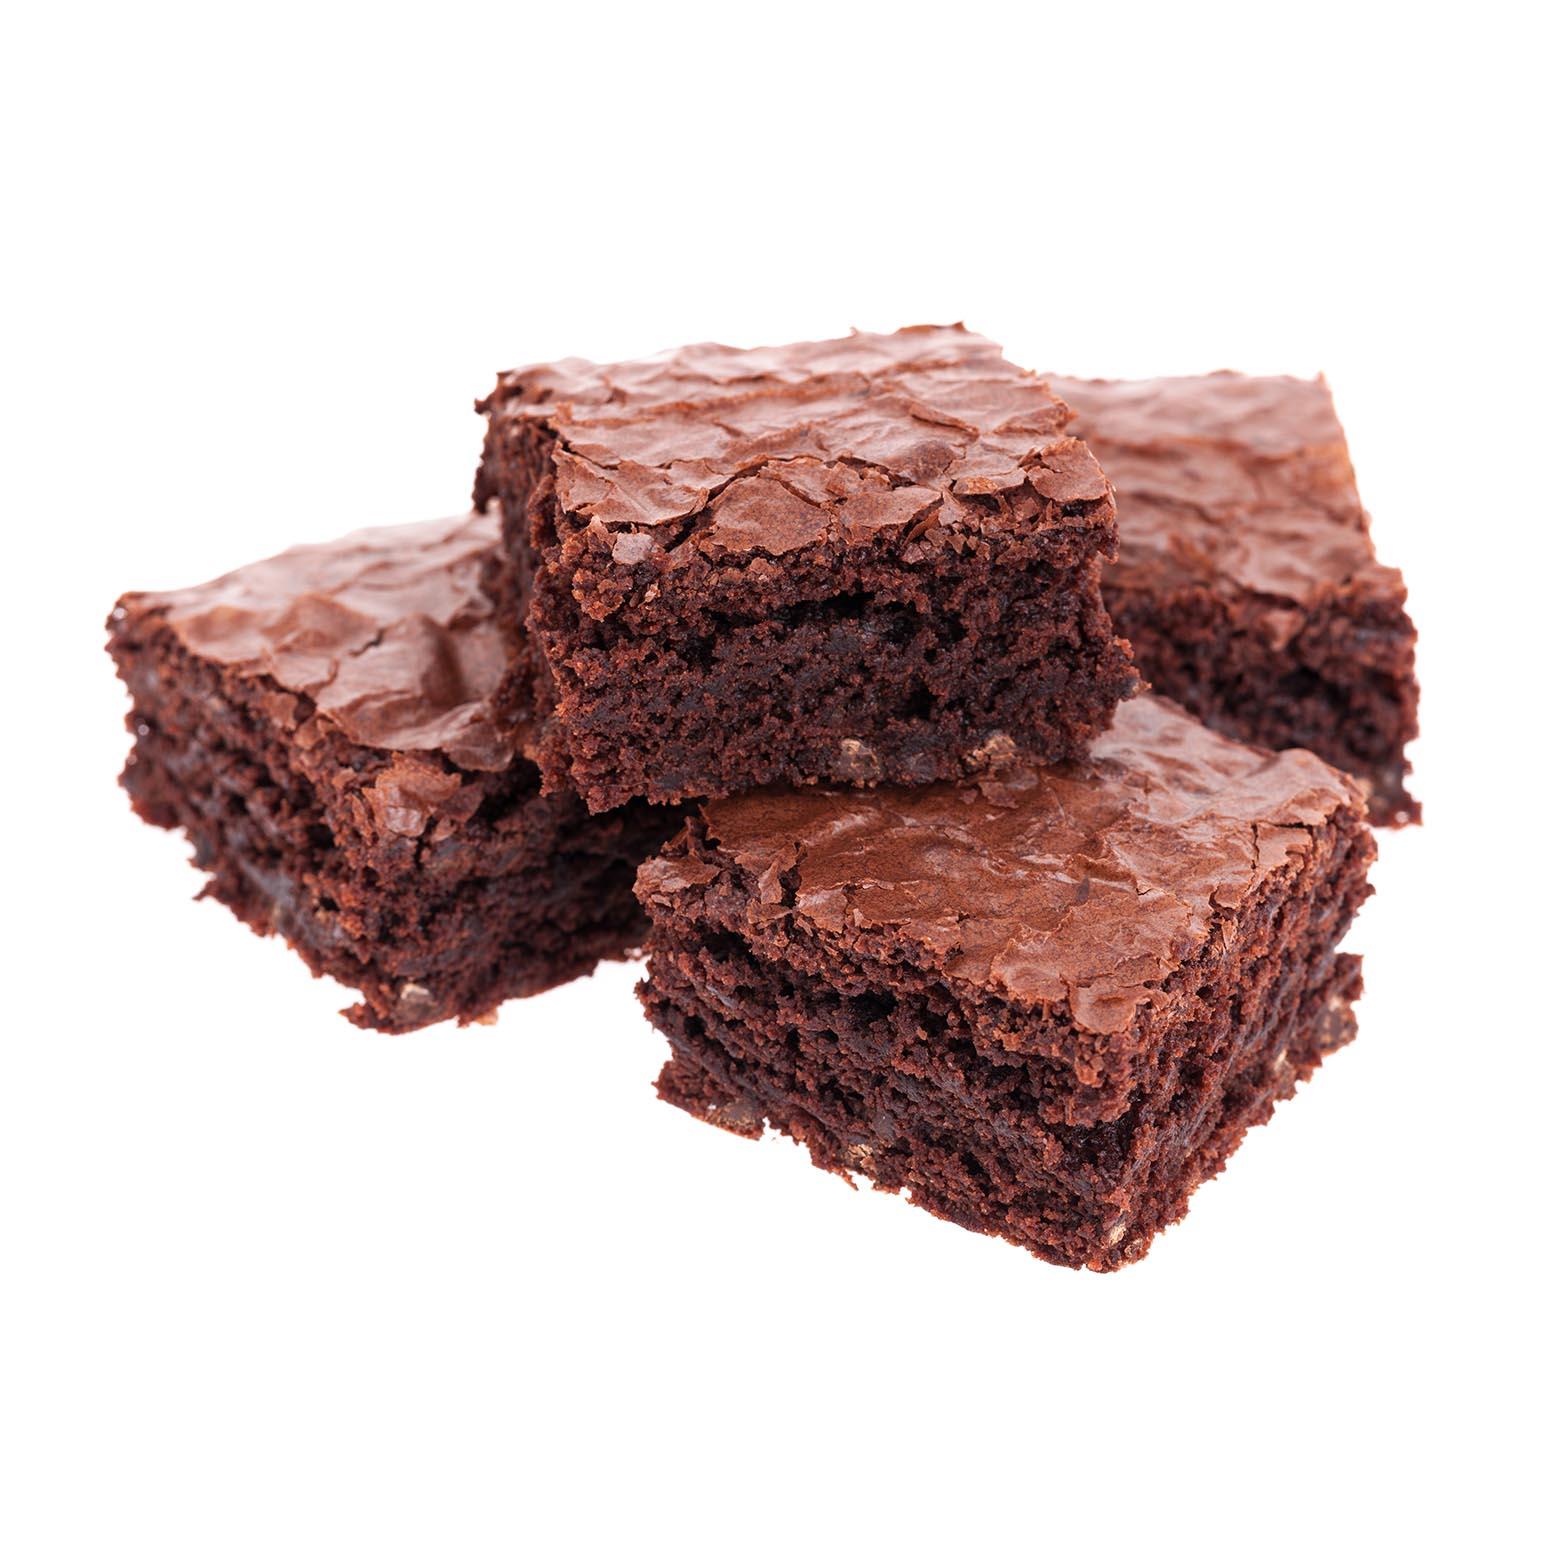 Kiki's Brownies Feature